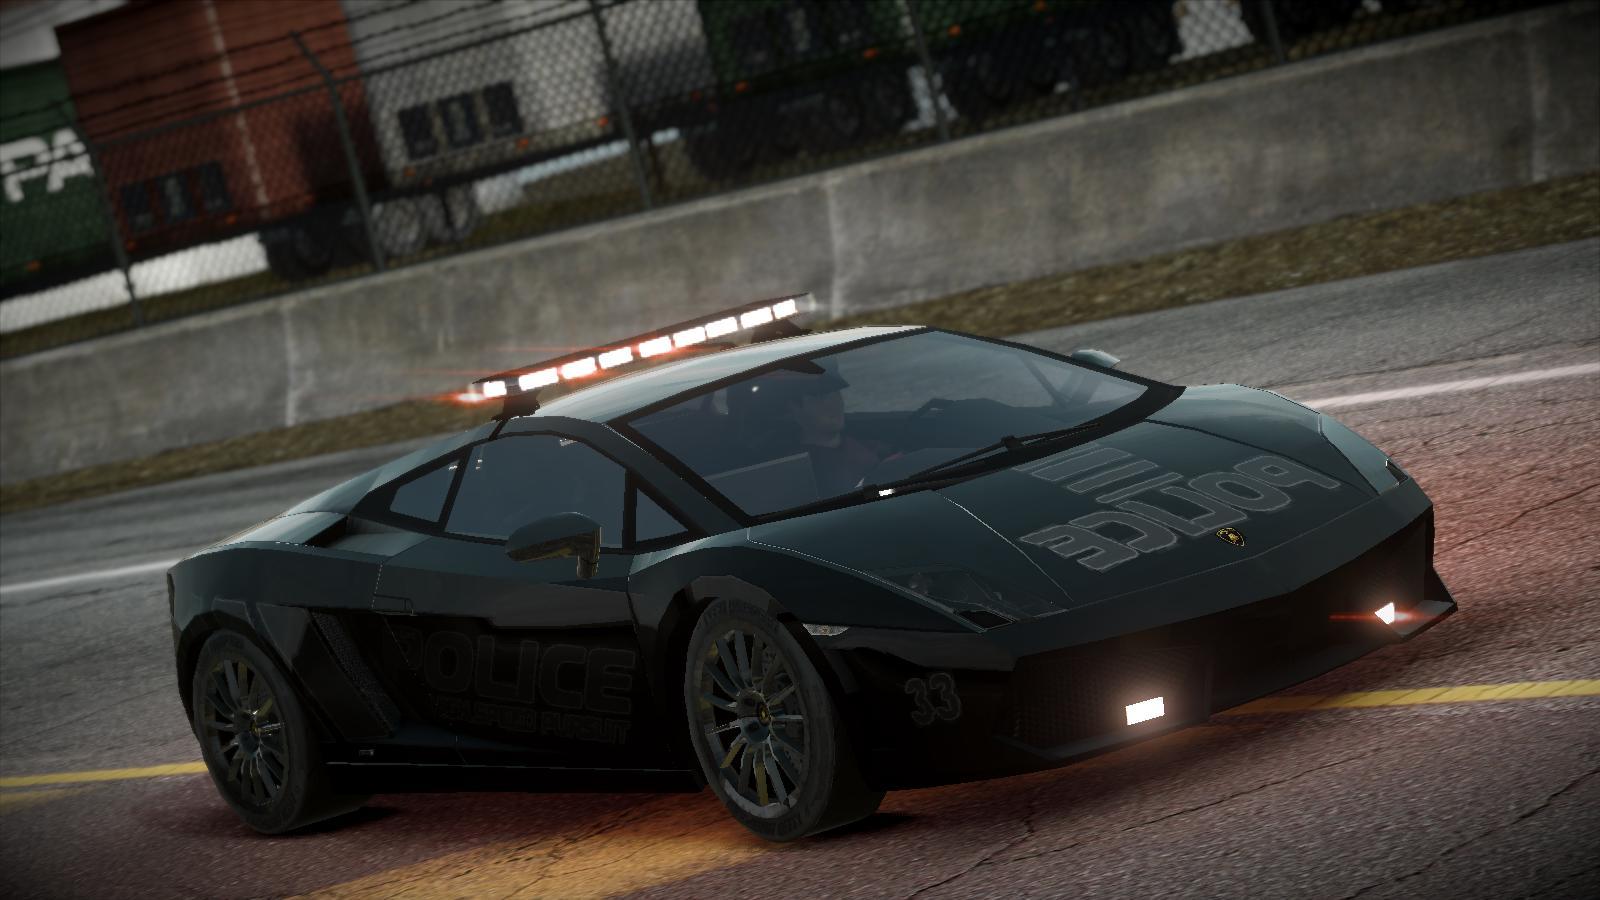 Lamborghini Gallardo LP 550-2 Federal Cruiser